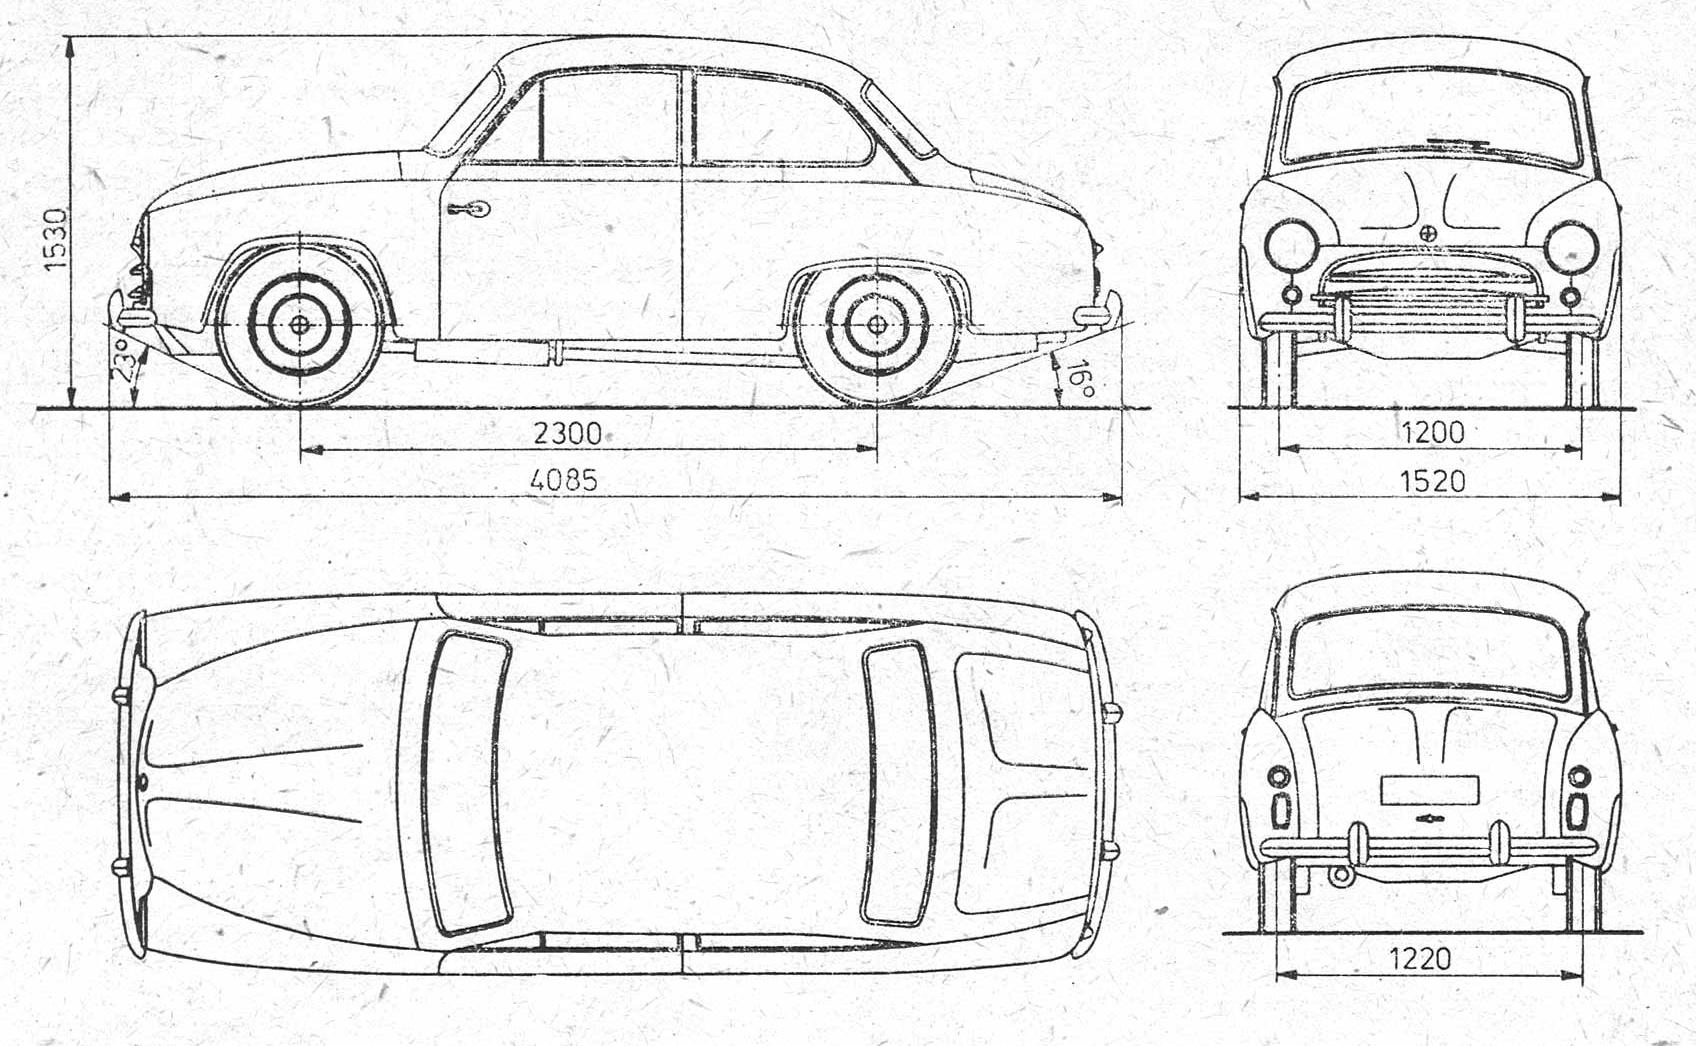 FSO Syrena 100 blueprint